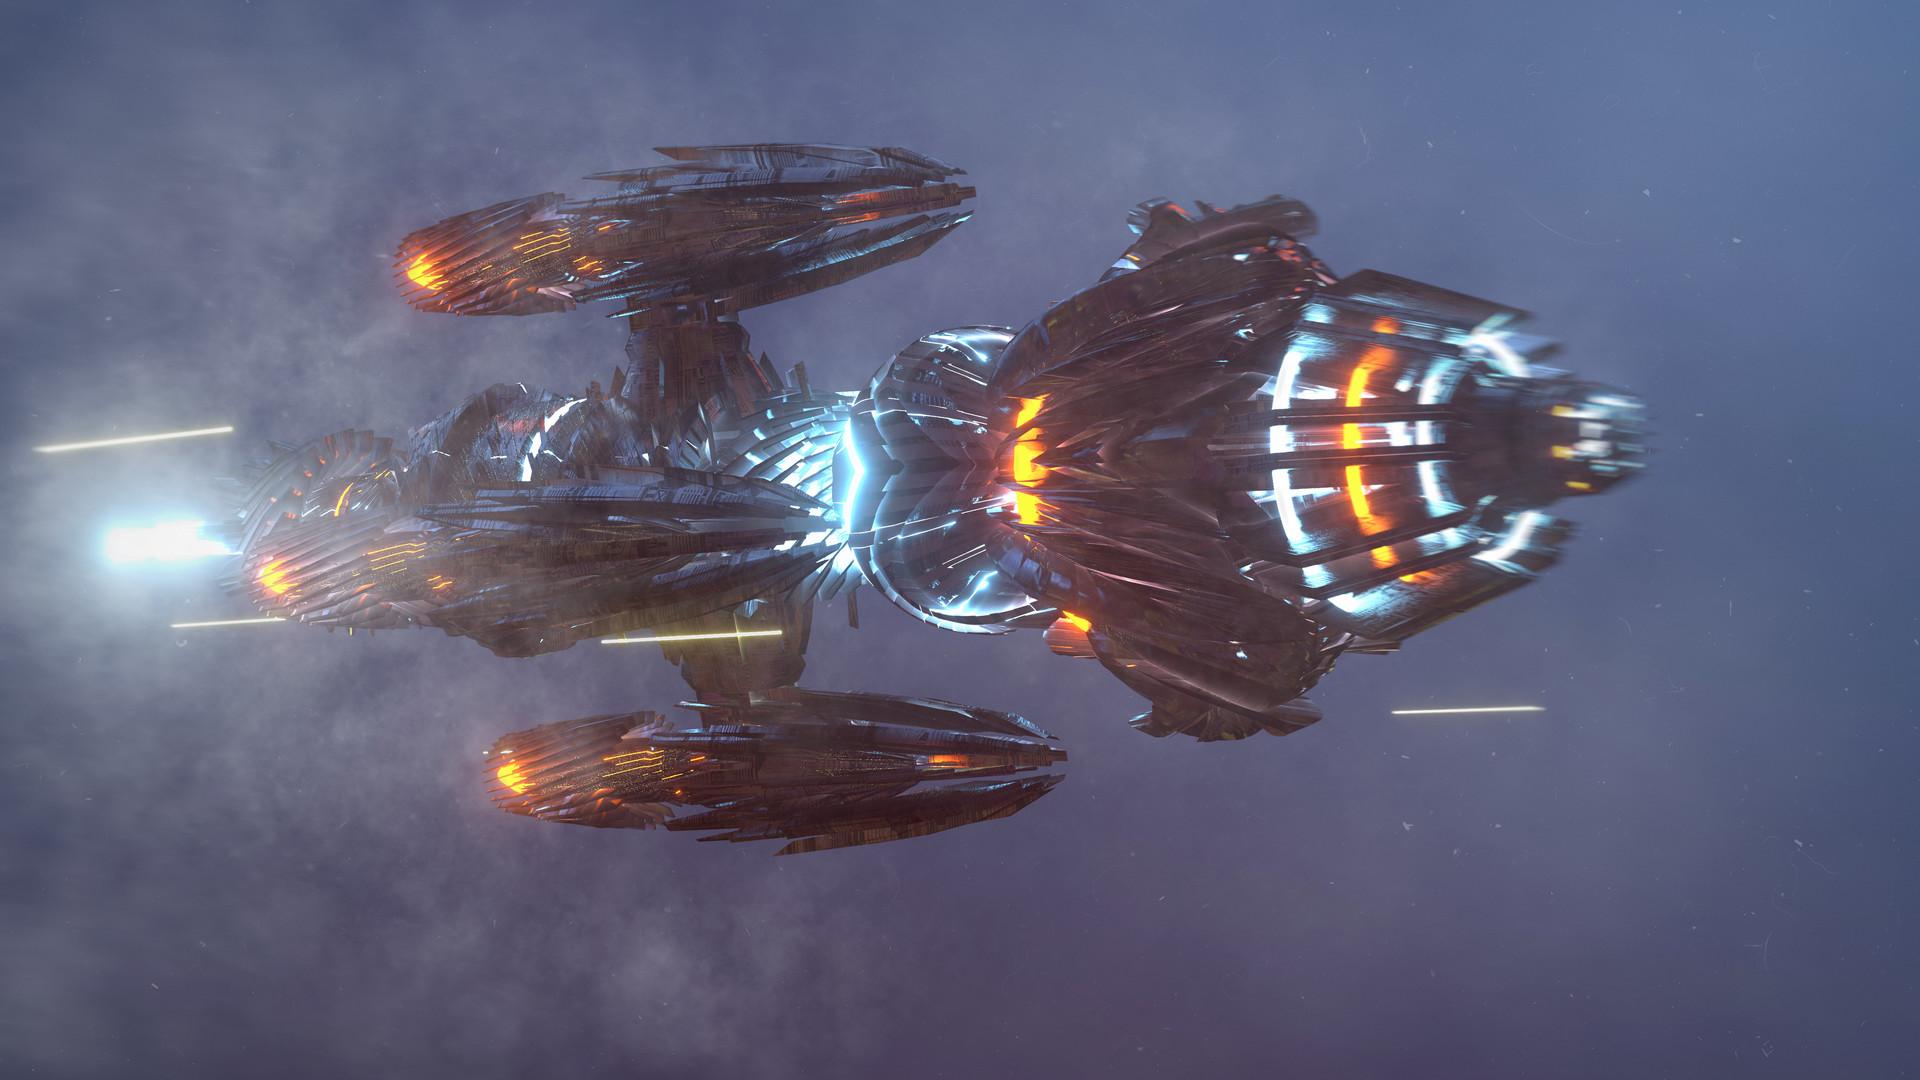 Kresimir jelusic robob3ar 245 140616 starship 5k